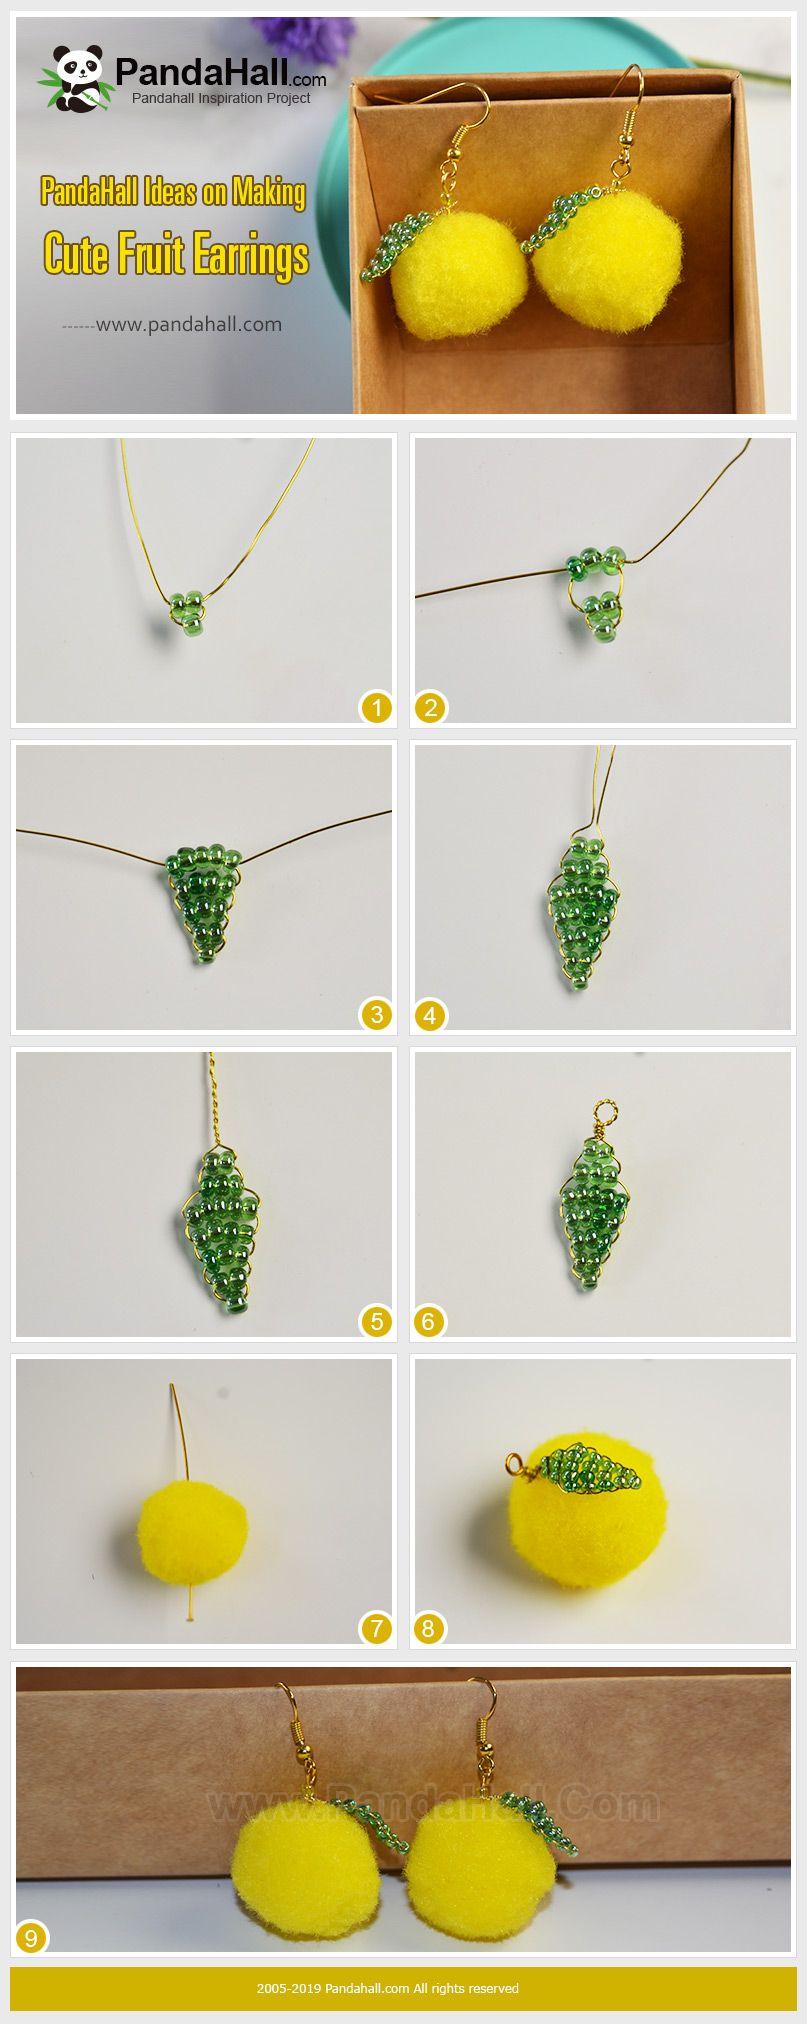 Pandahall Ideas On Making Cute Fruit Earrings Pandahall Jewelry